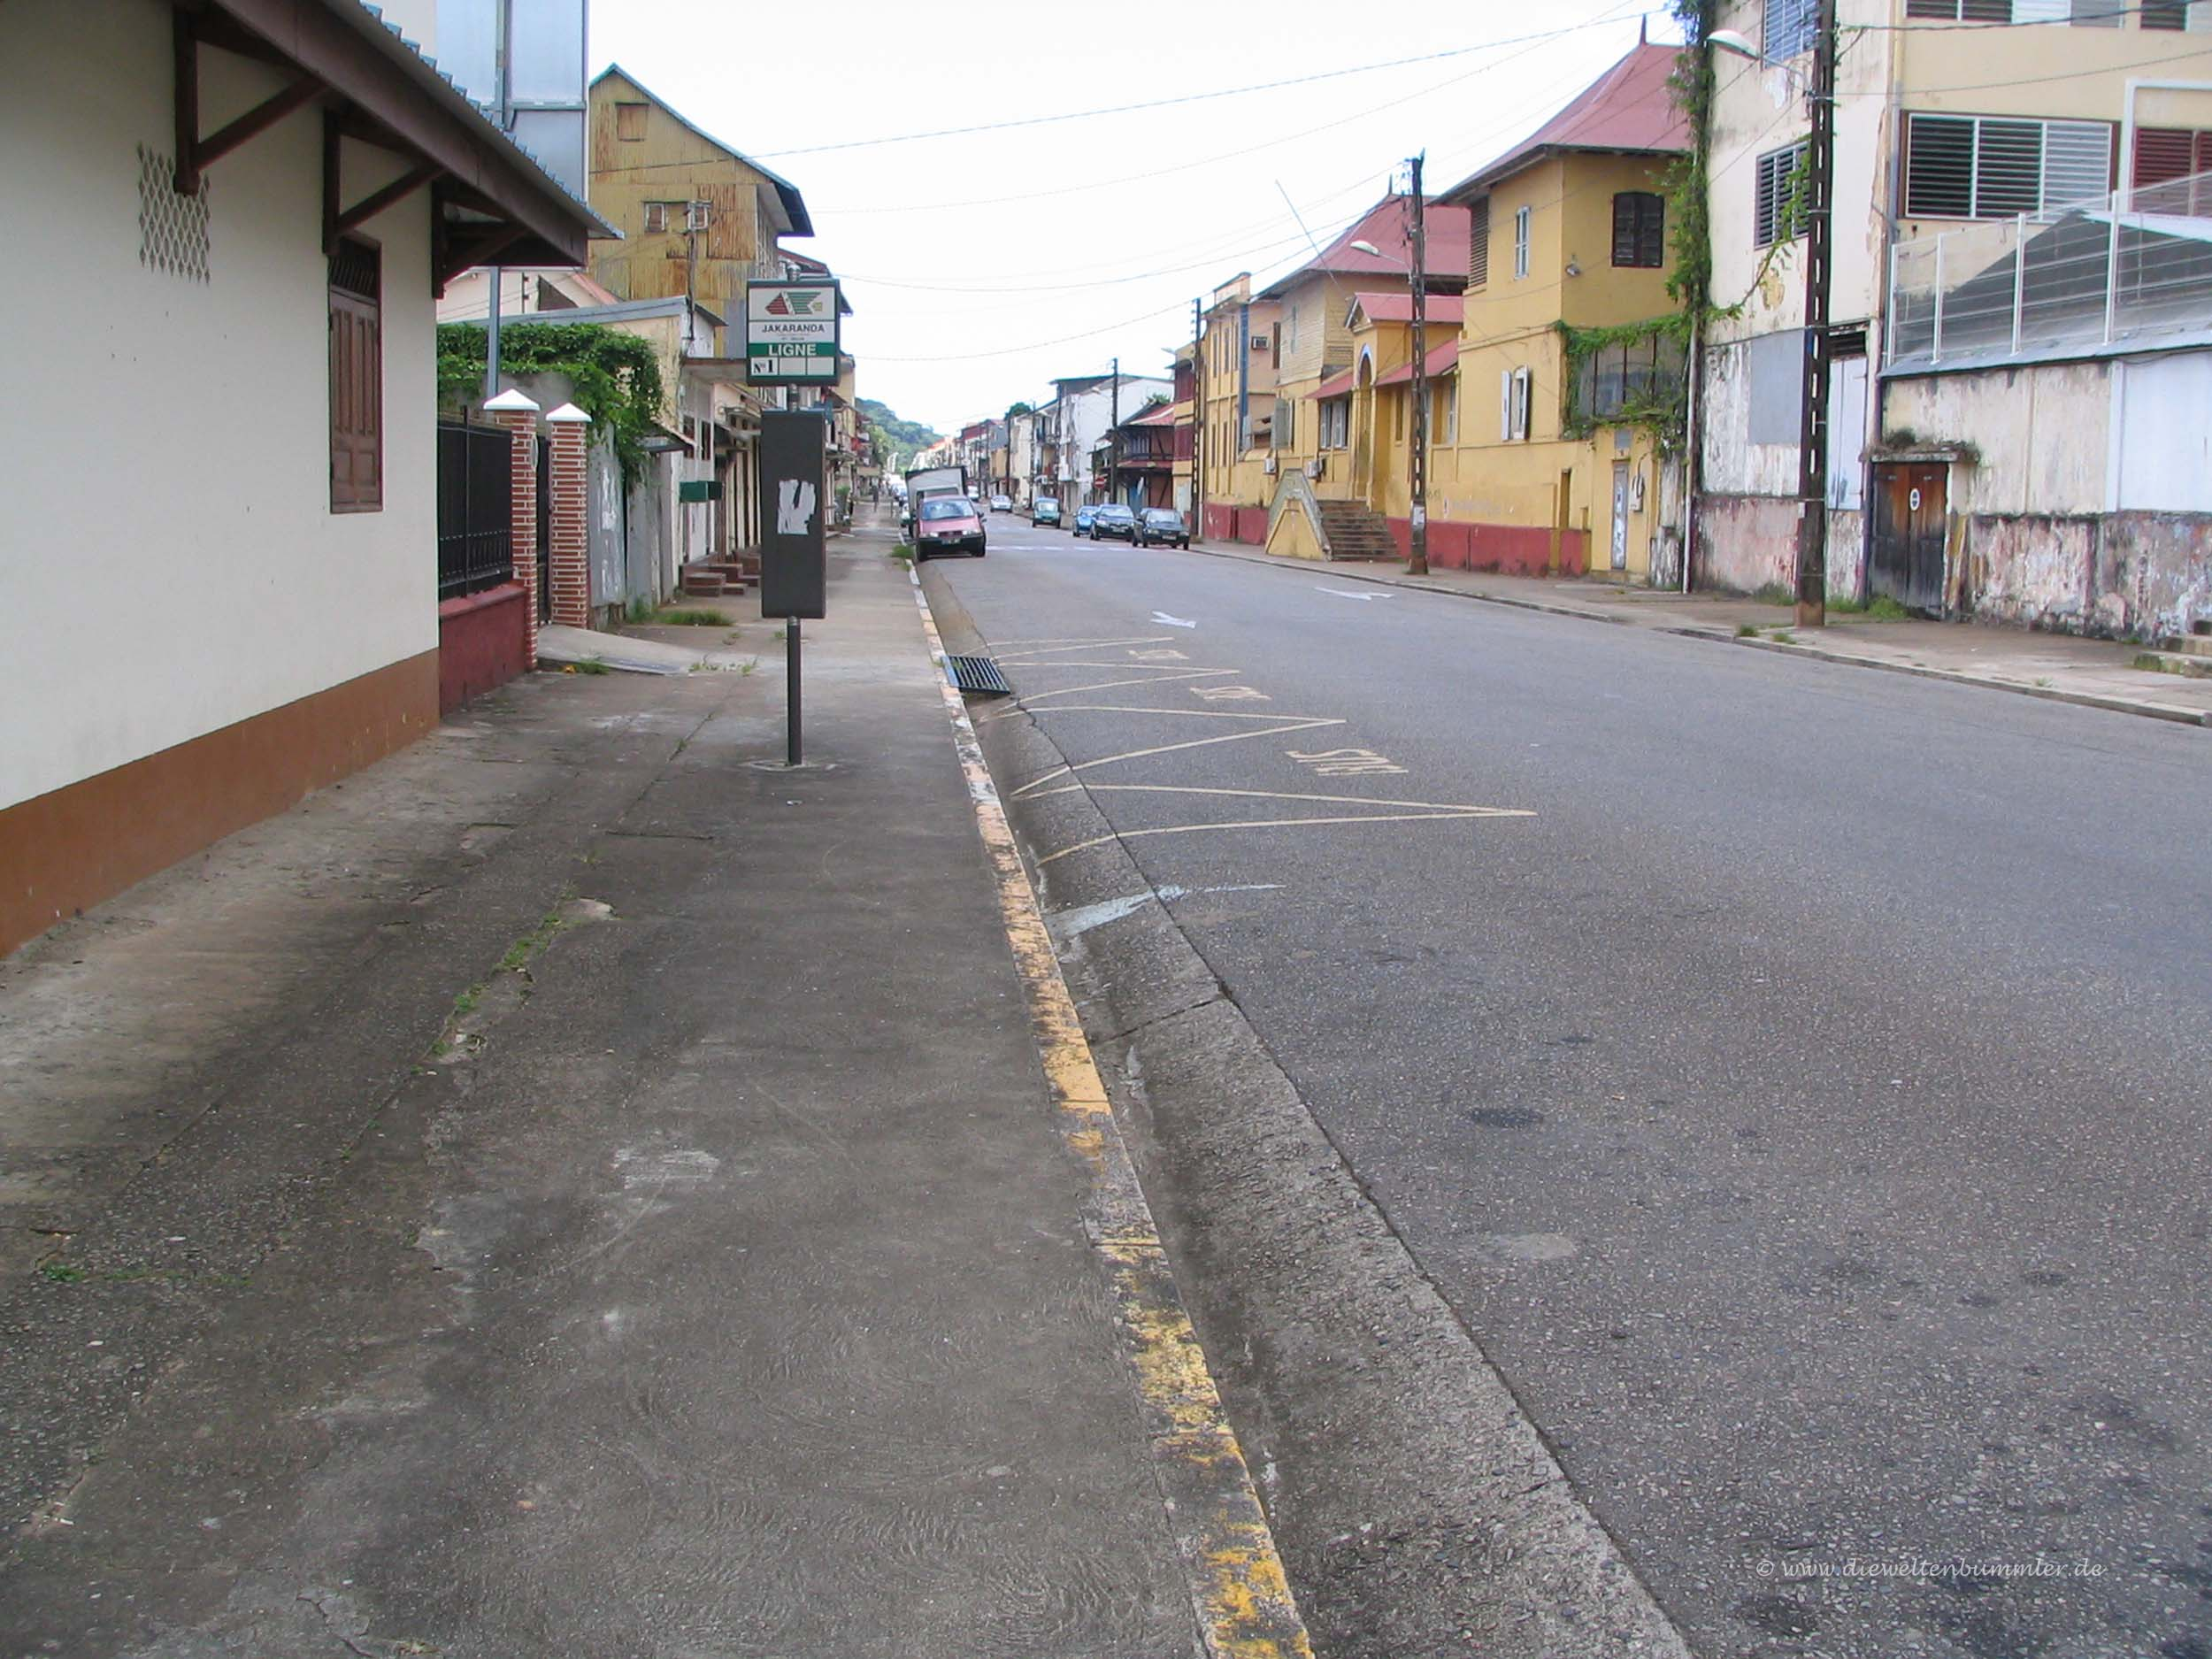 Leere Straßen in Cayenne